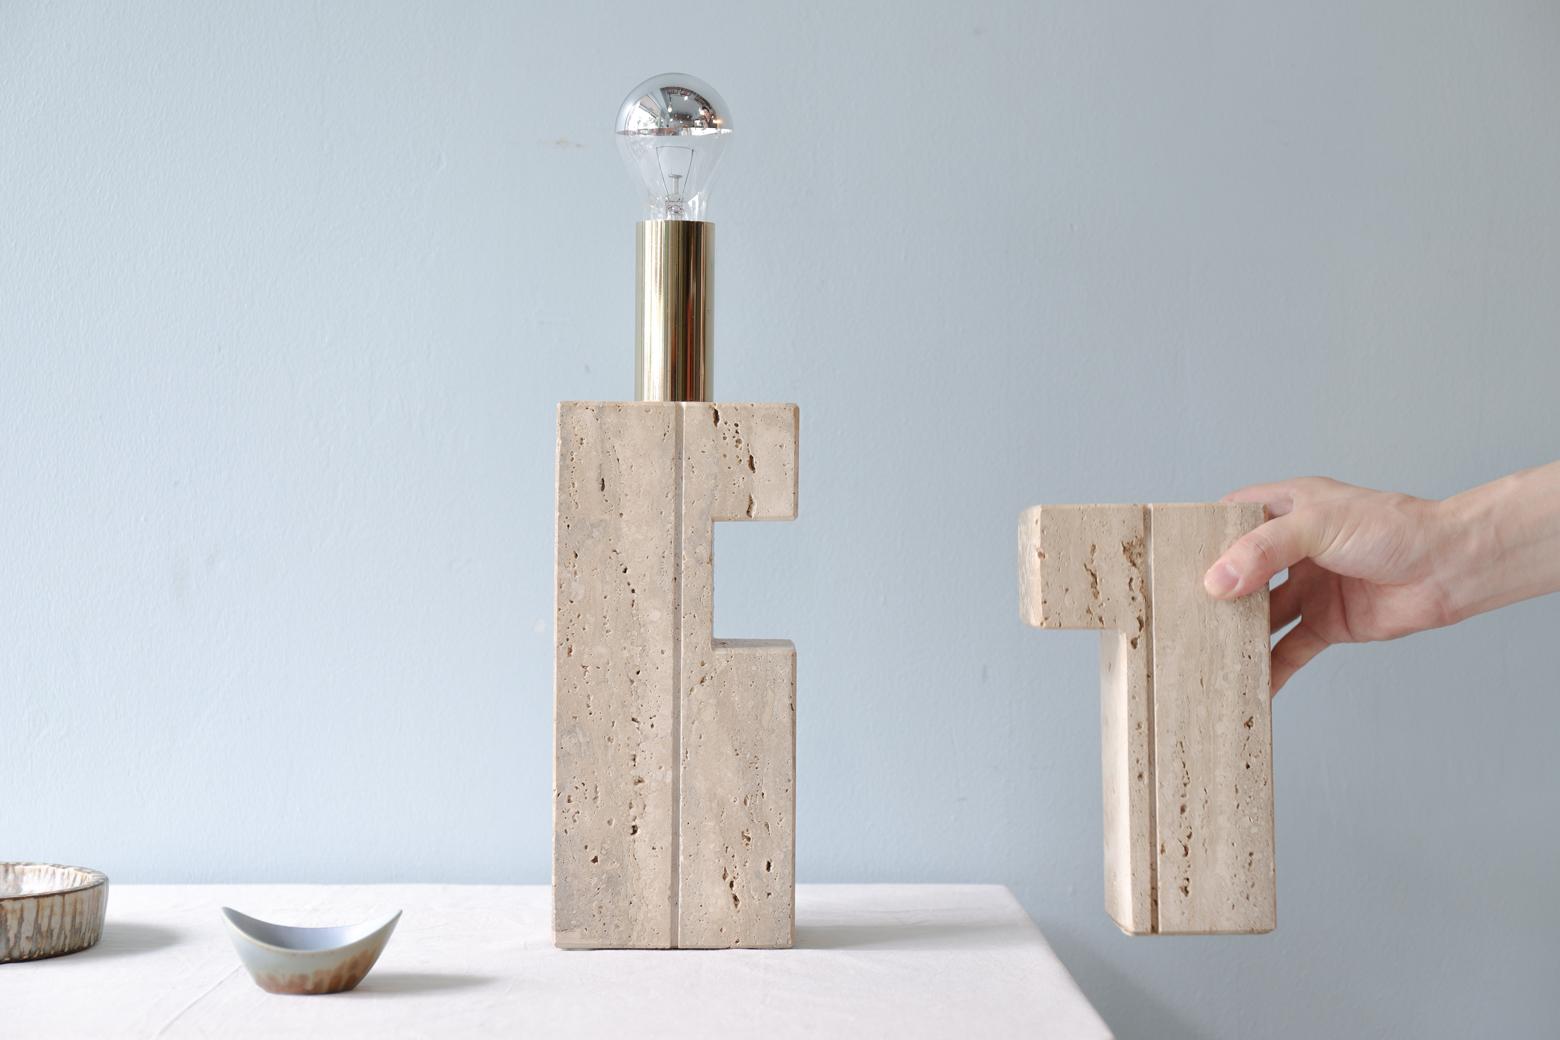 Fratelli Mannelli Italy Lamp Vase/ イタリア ヴィンテージ ランプ ベース 花瓶 モダン